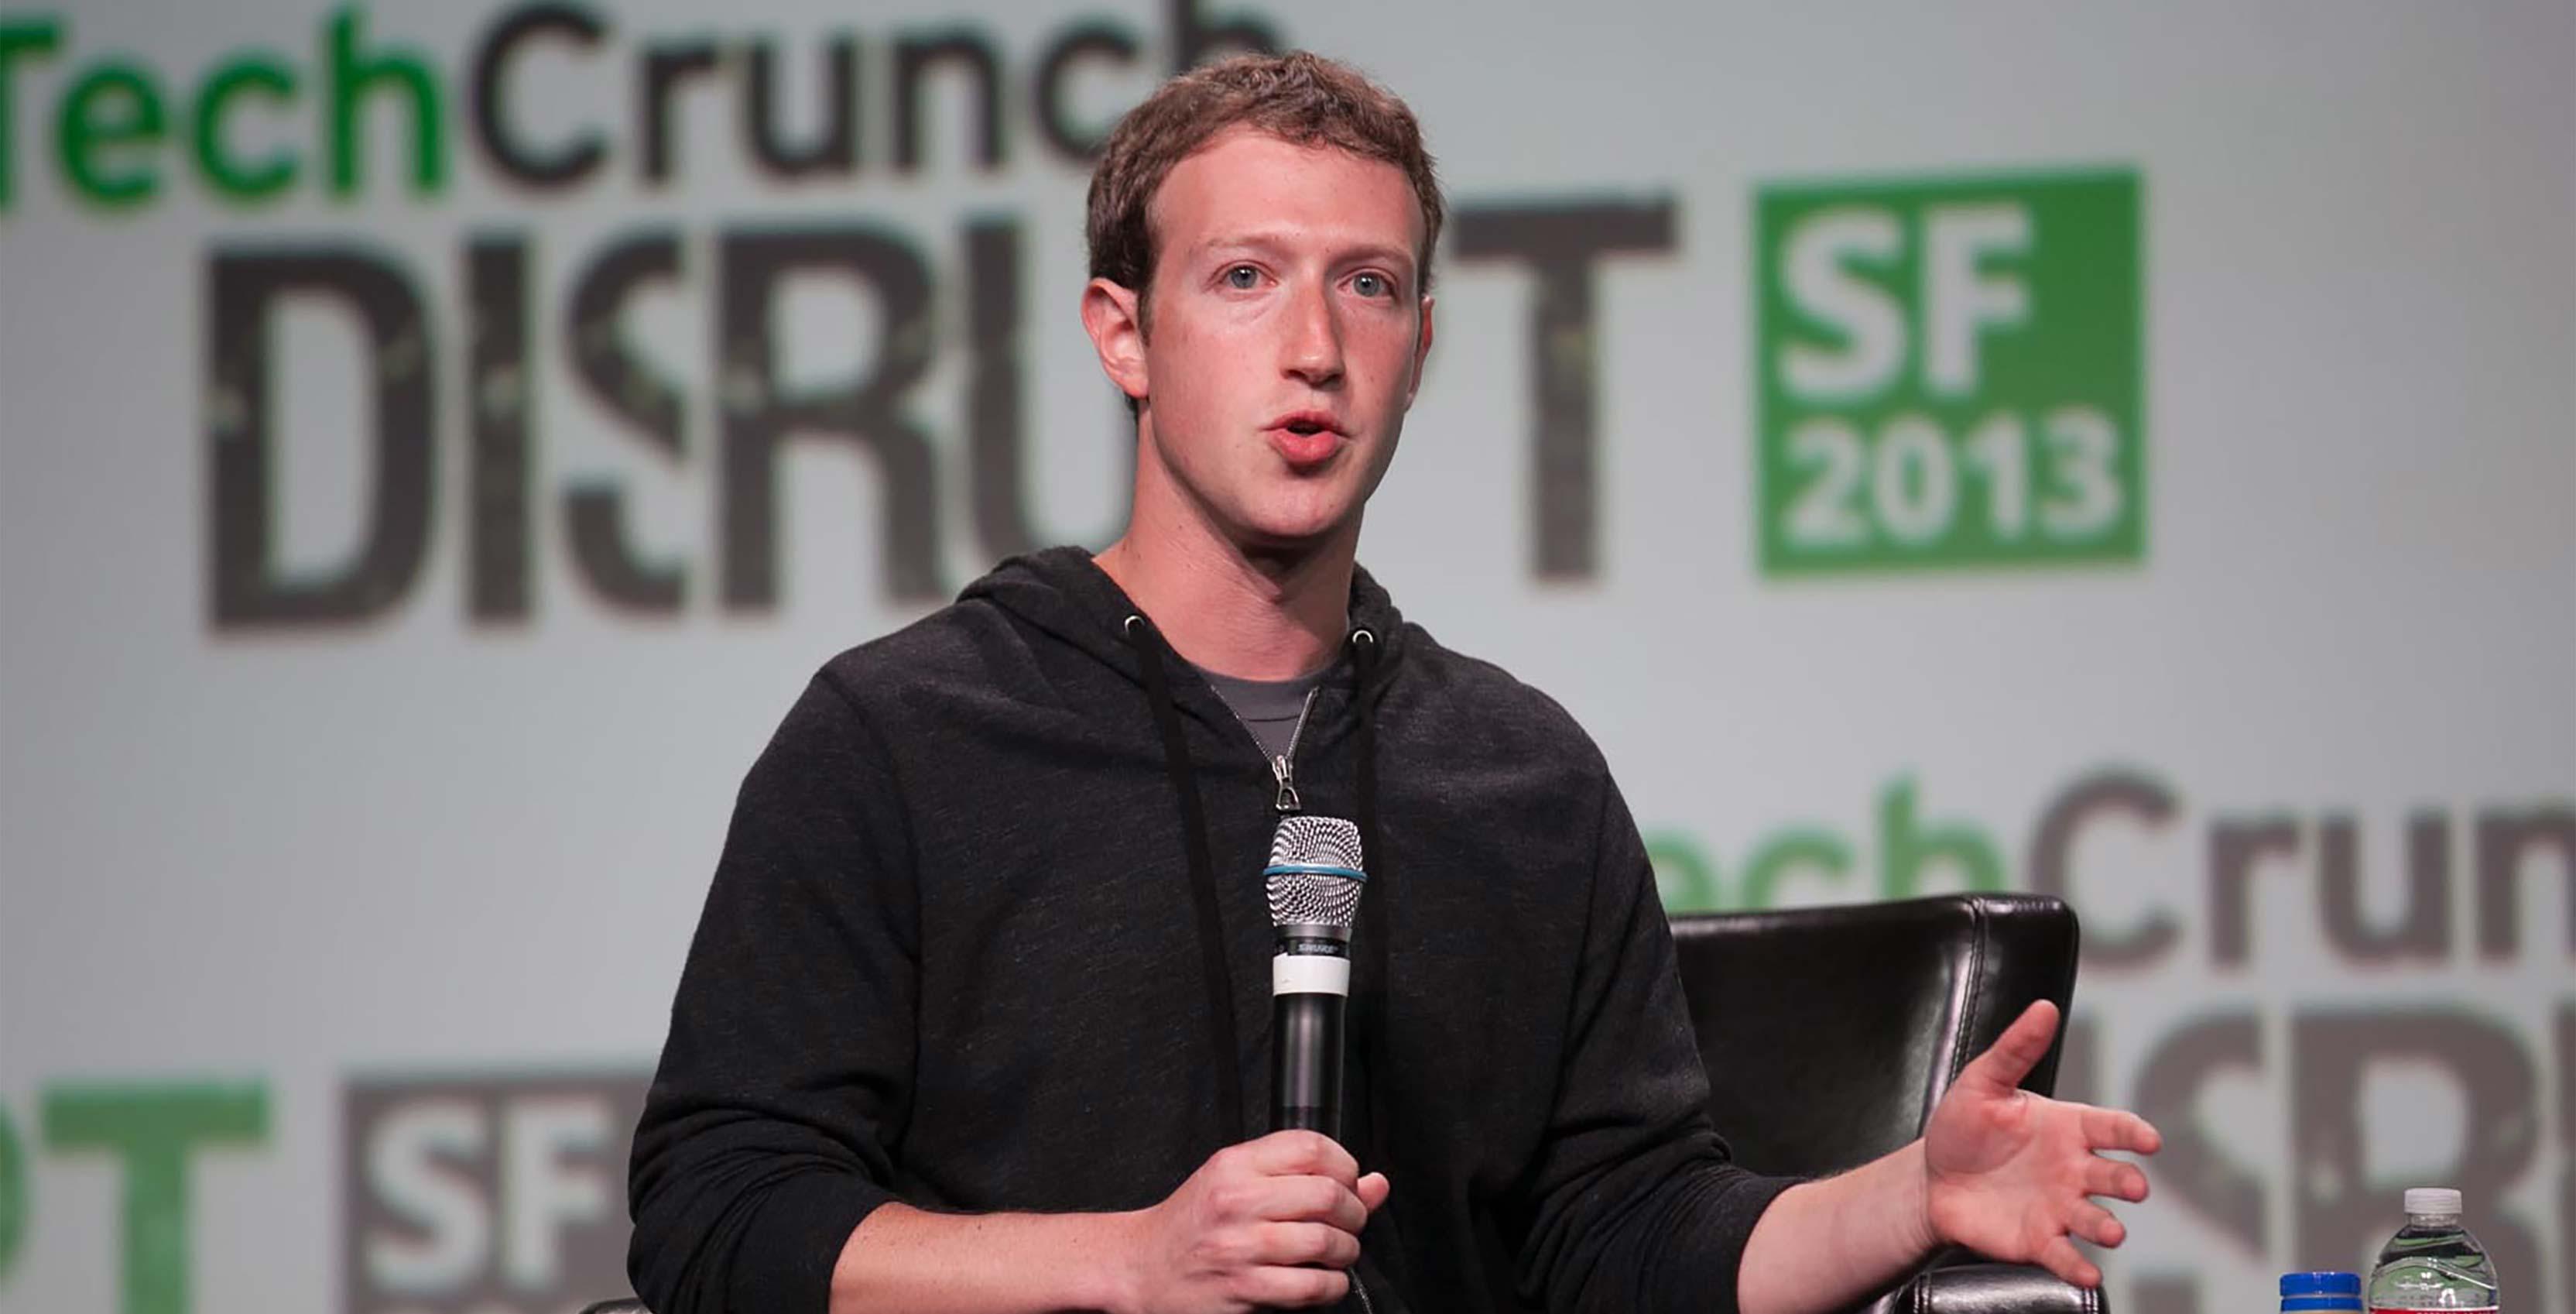 Facebook CEO Mark Zuckerberg at TechCrunch Disrupt 2013